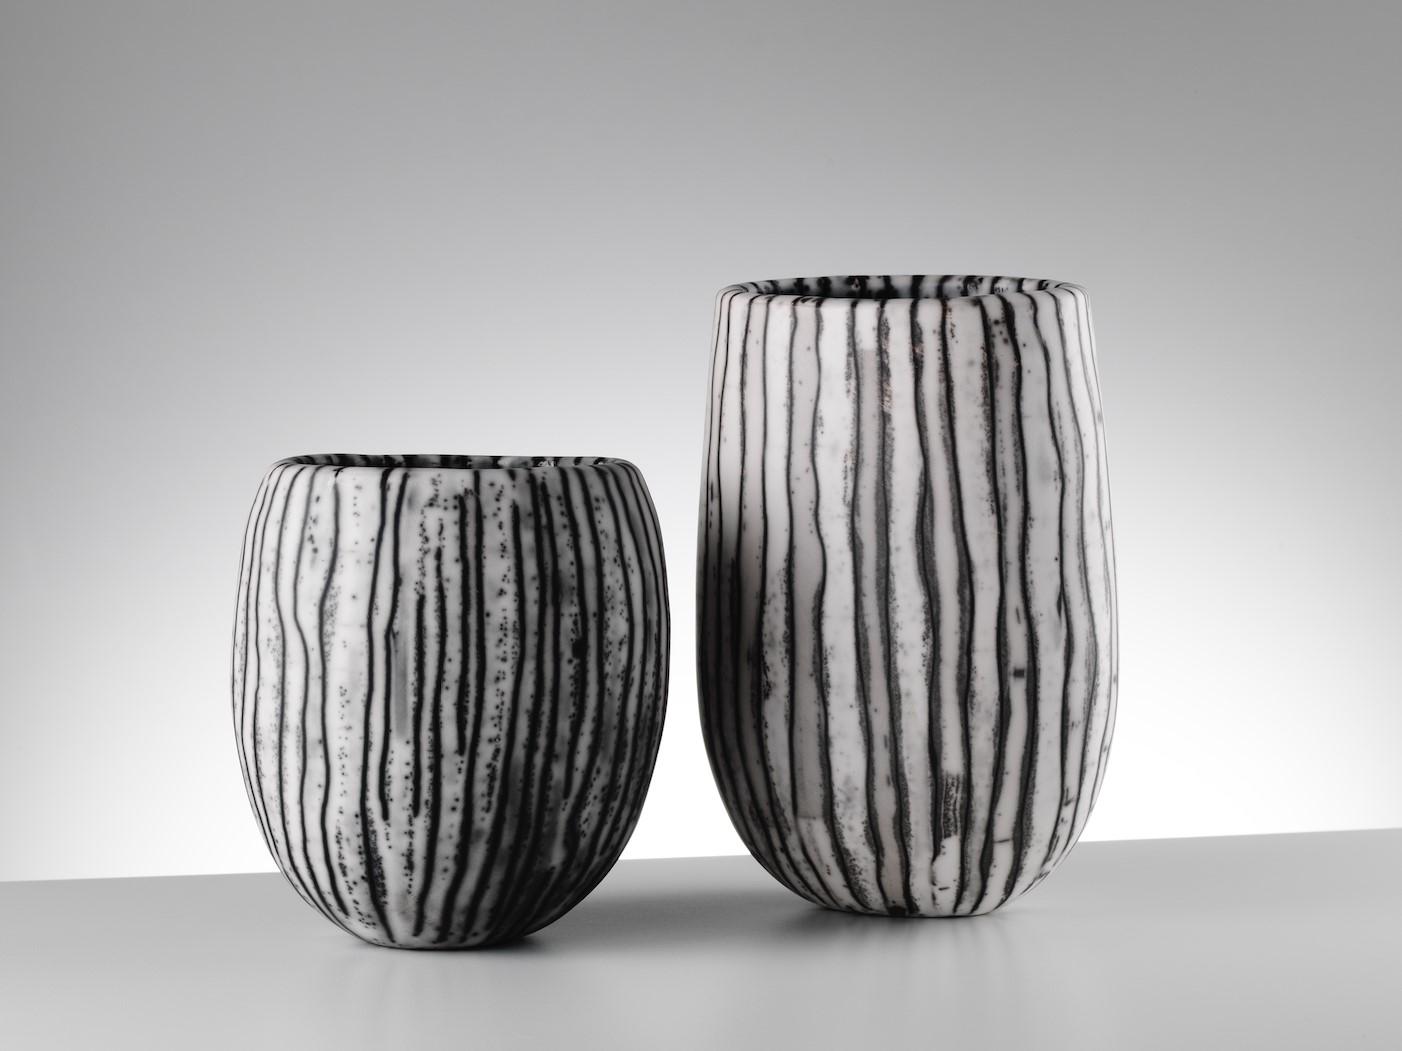 Vertical Stripe Vessels Medium Small & Small  17 cm H x 13 cm W / 23 cm H x 14 cm W  £195 and £295